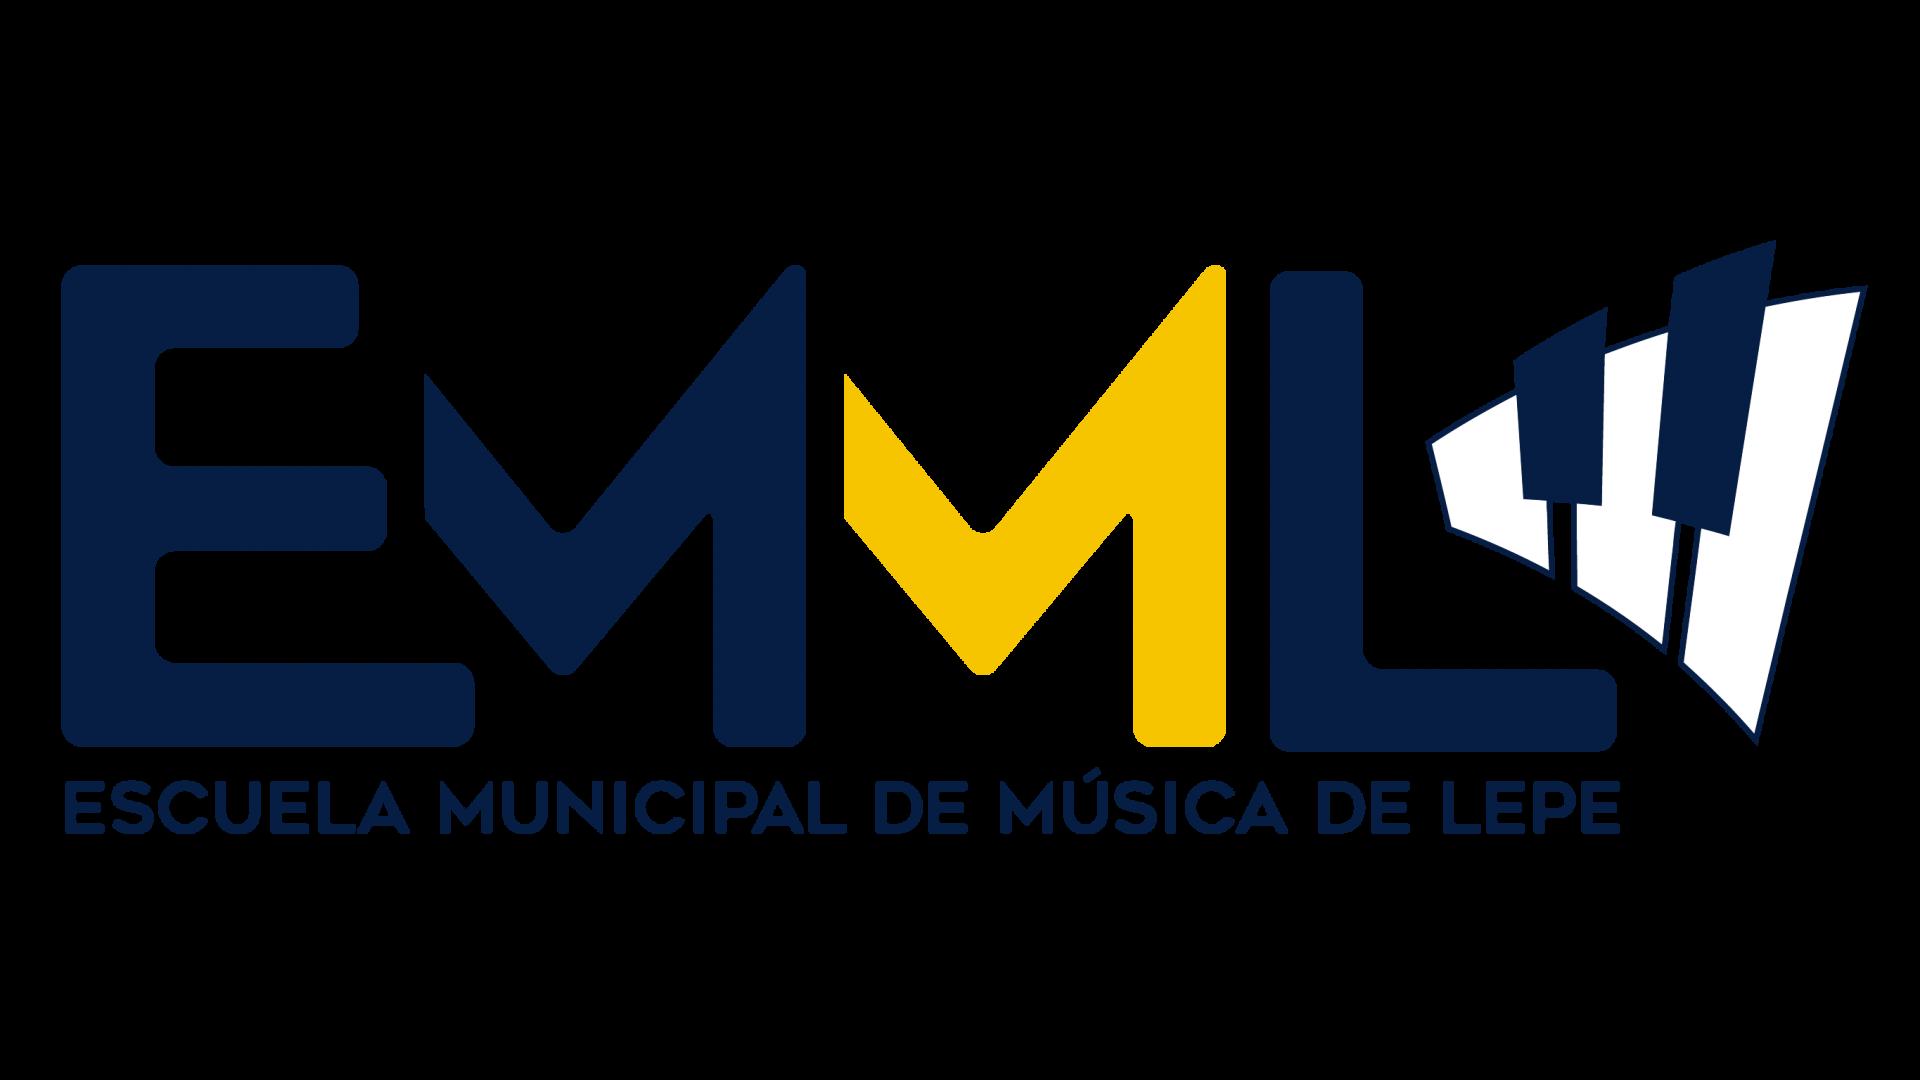 Escuela Municipal de Música de Lepe